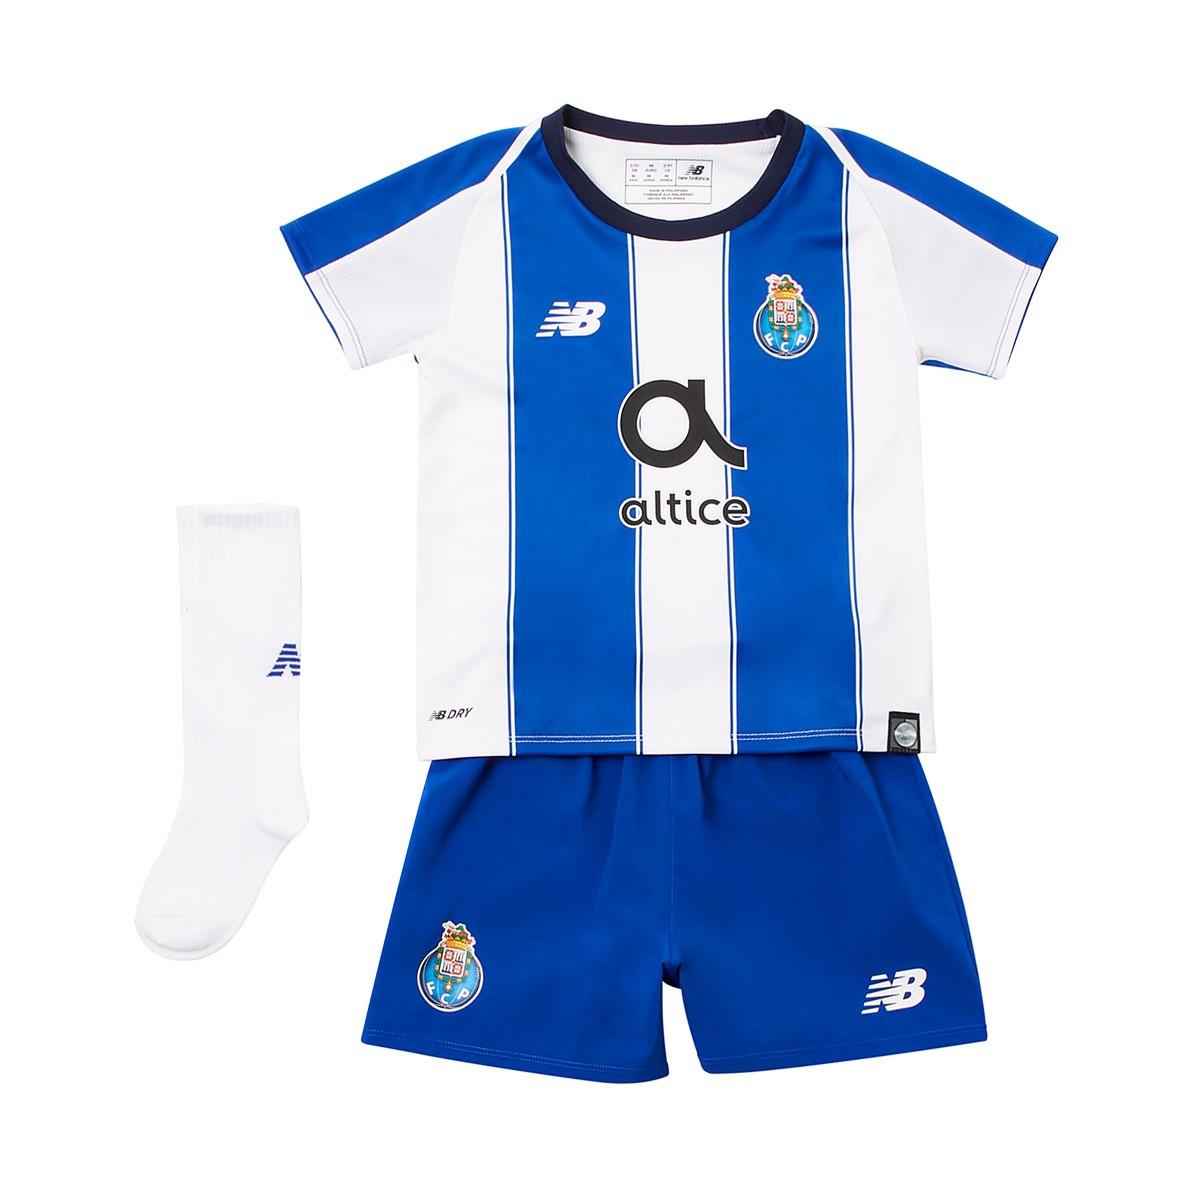 Kit New Balance Kids FC Porto 2018-2019 Home Blue-White - Football ... cda5cc5d28af0